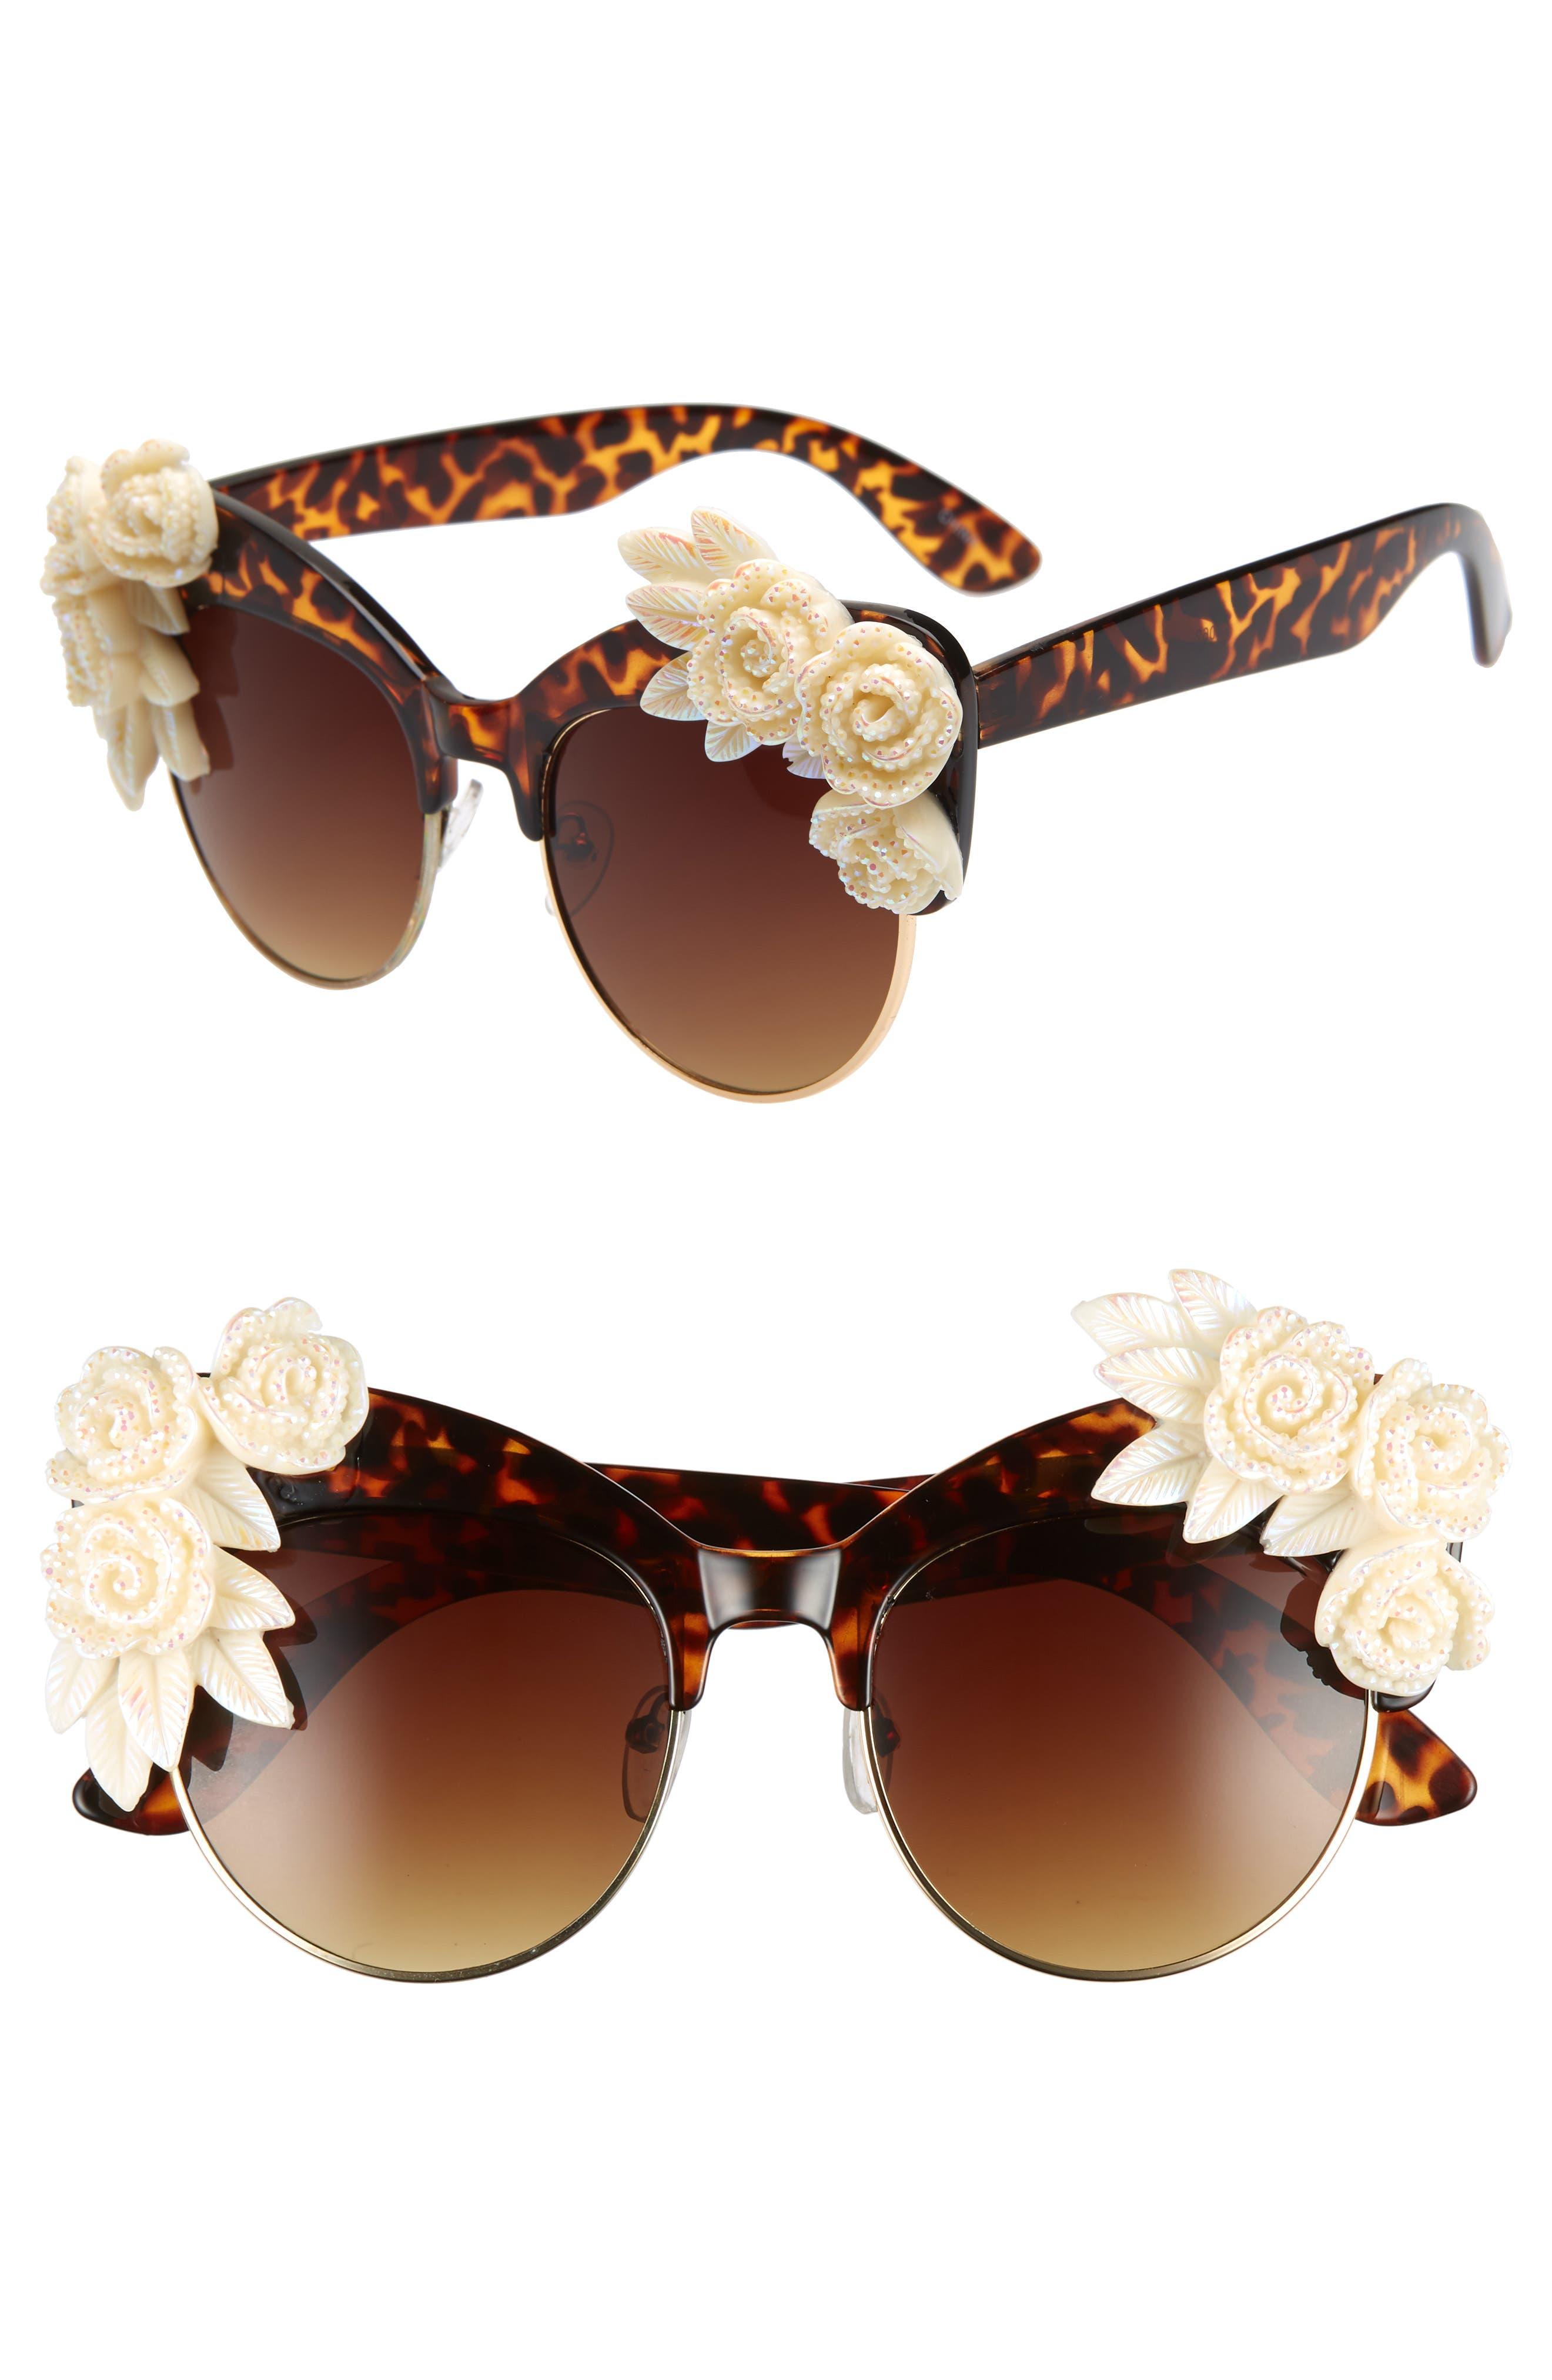 Rad + Refined Flower Cat Eye Sunglasses - Tort/ Cream